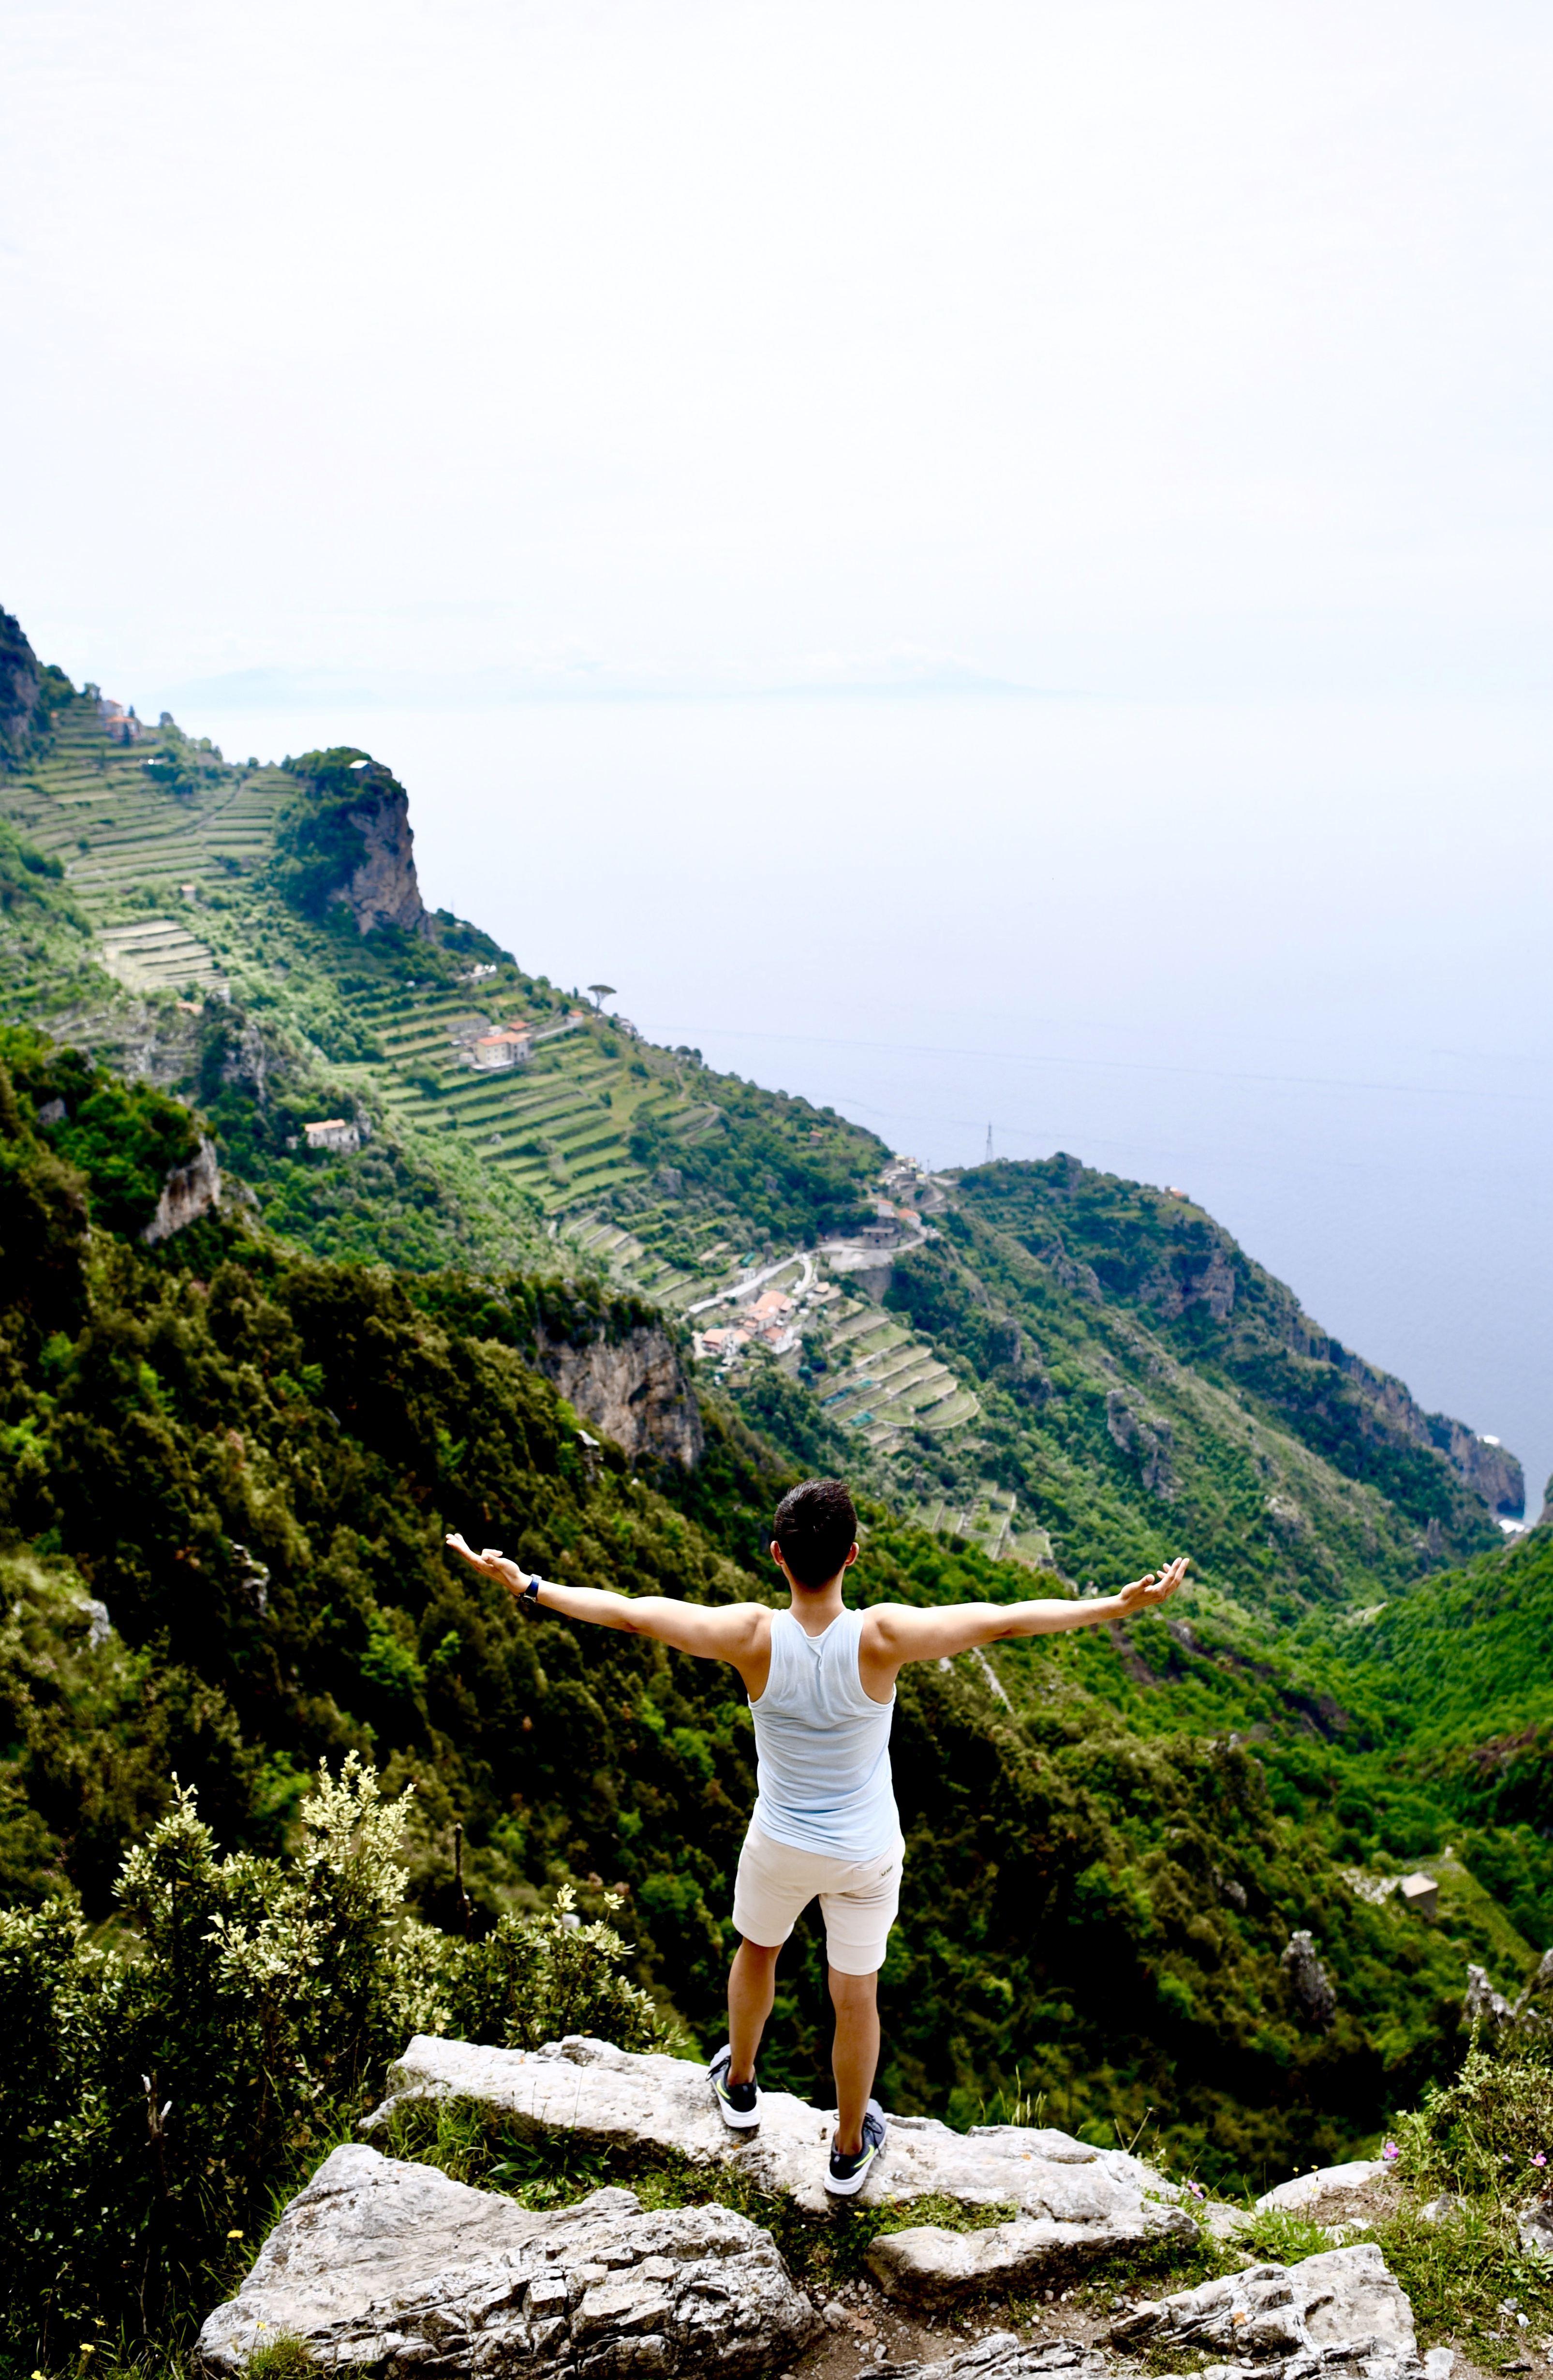 Sentiero Degli Dei Outlook Arms Positano Amalfi Coast DNXB dongnanxibei